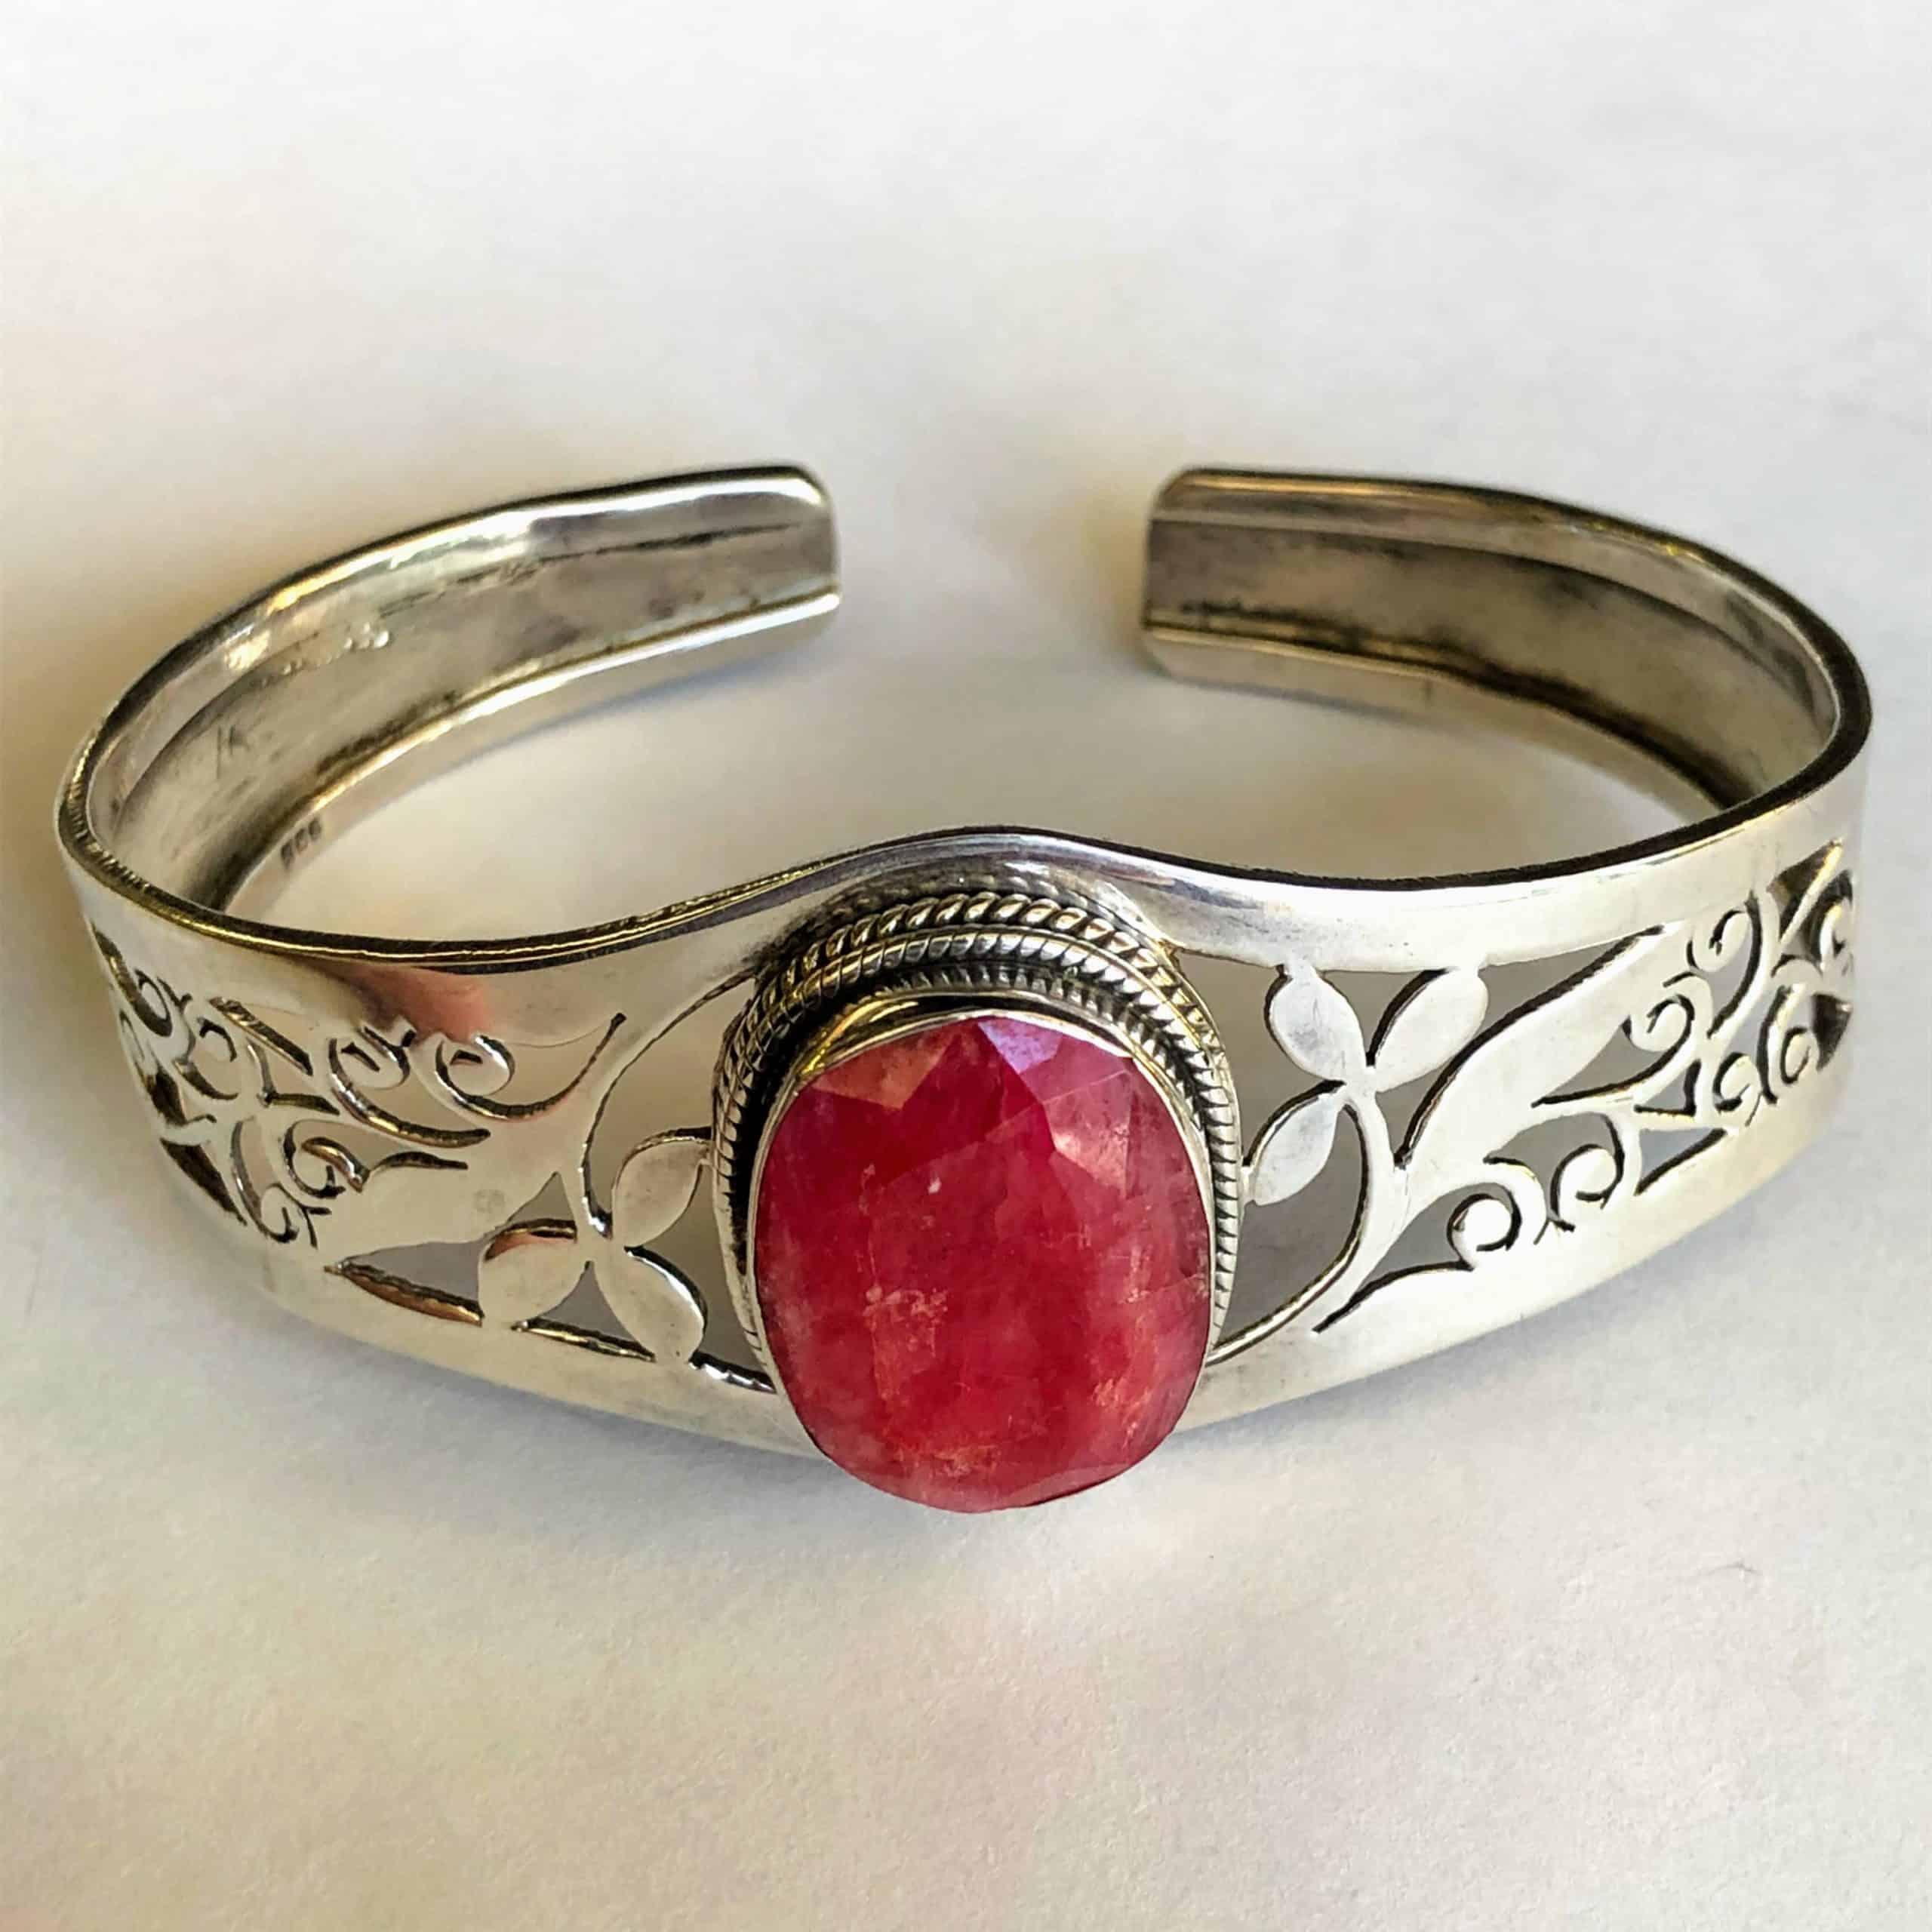 2.2cm Ruby Oval Sterling Silver Cuff Bracelet